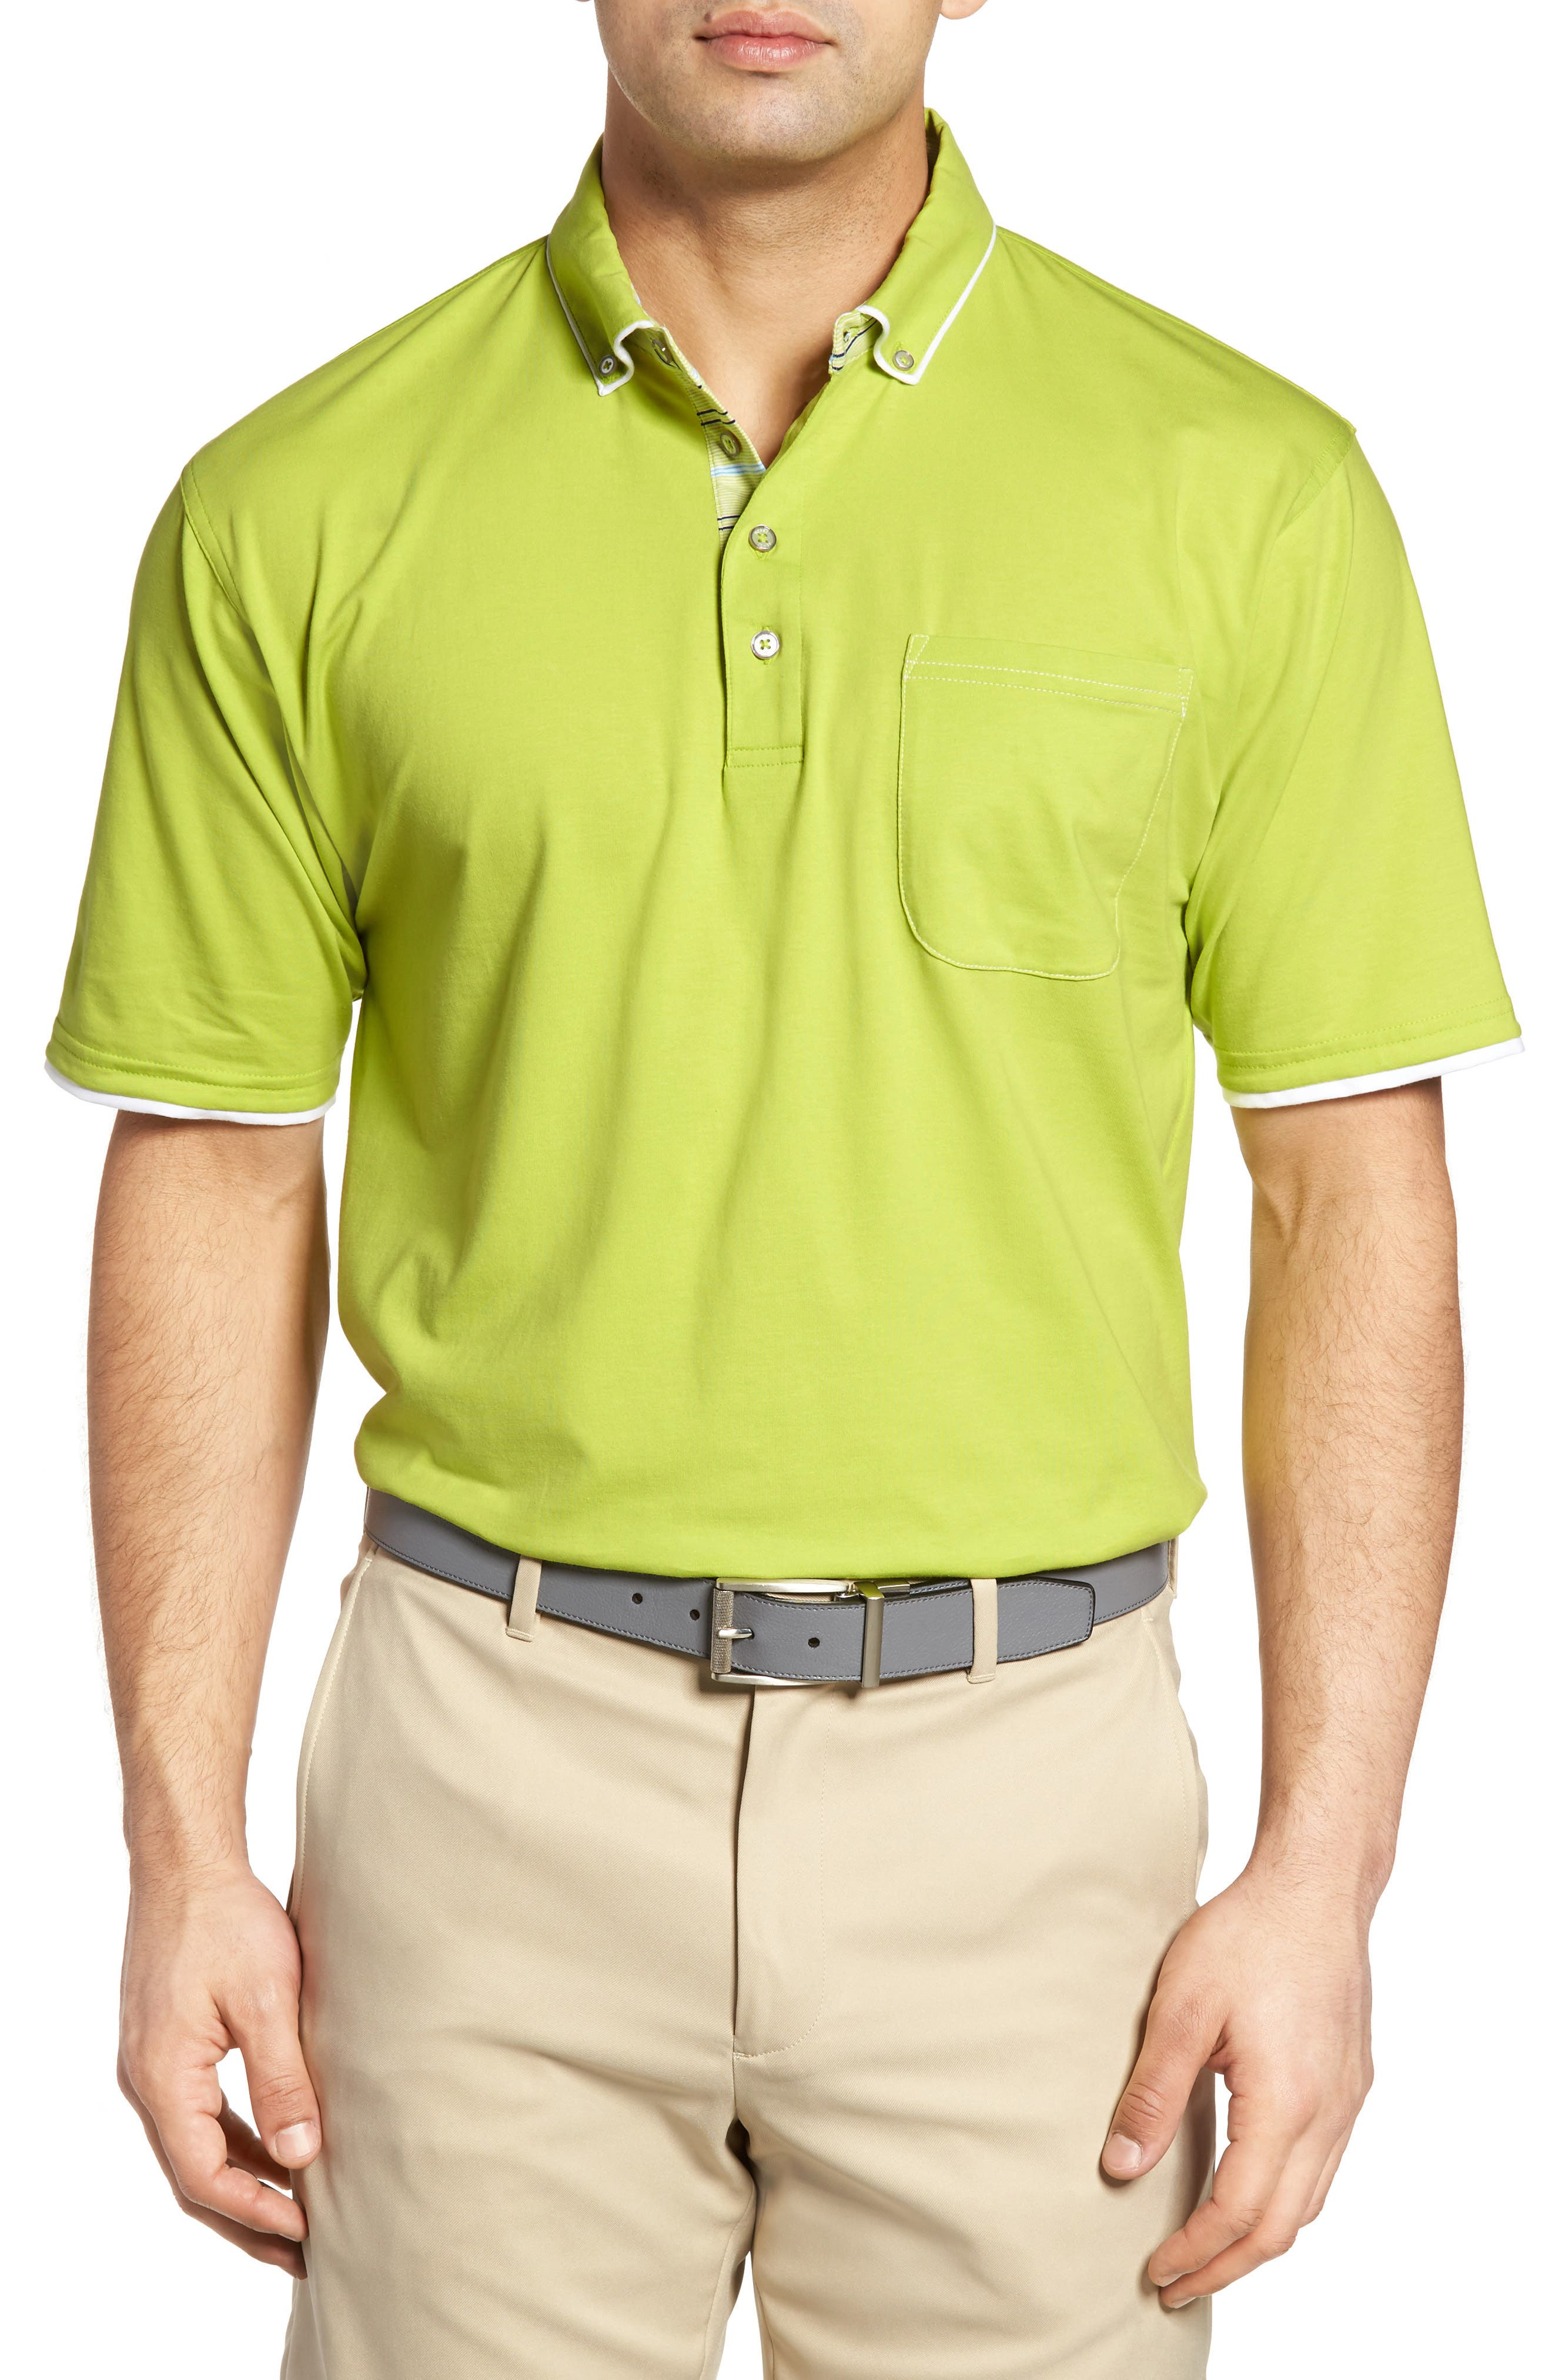 Bobby Jones Liquid Cotton Stretch Jersey Golf Polo